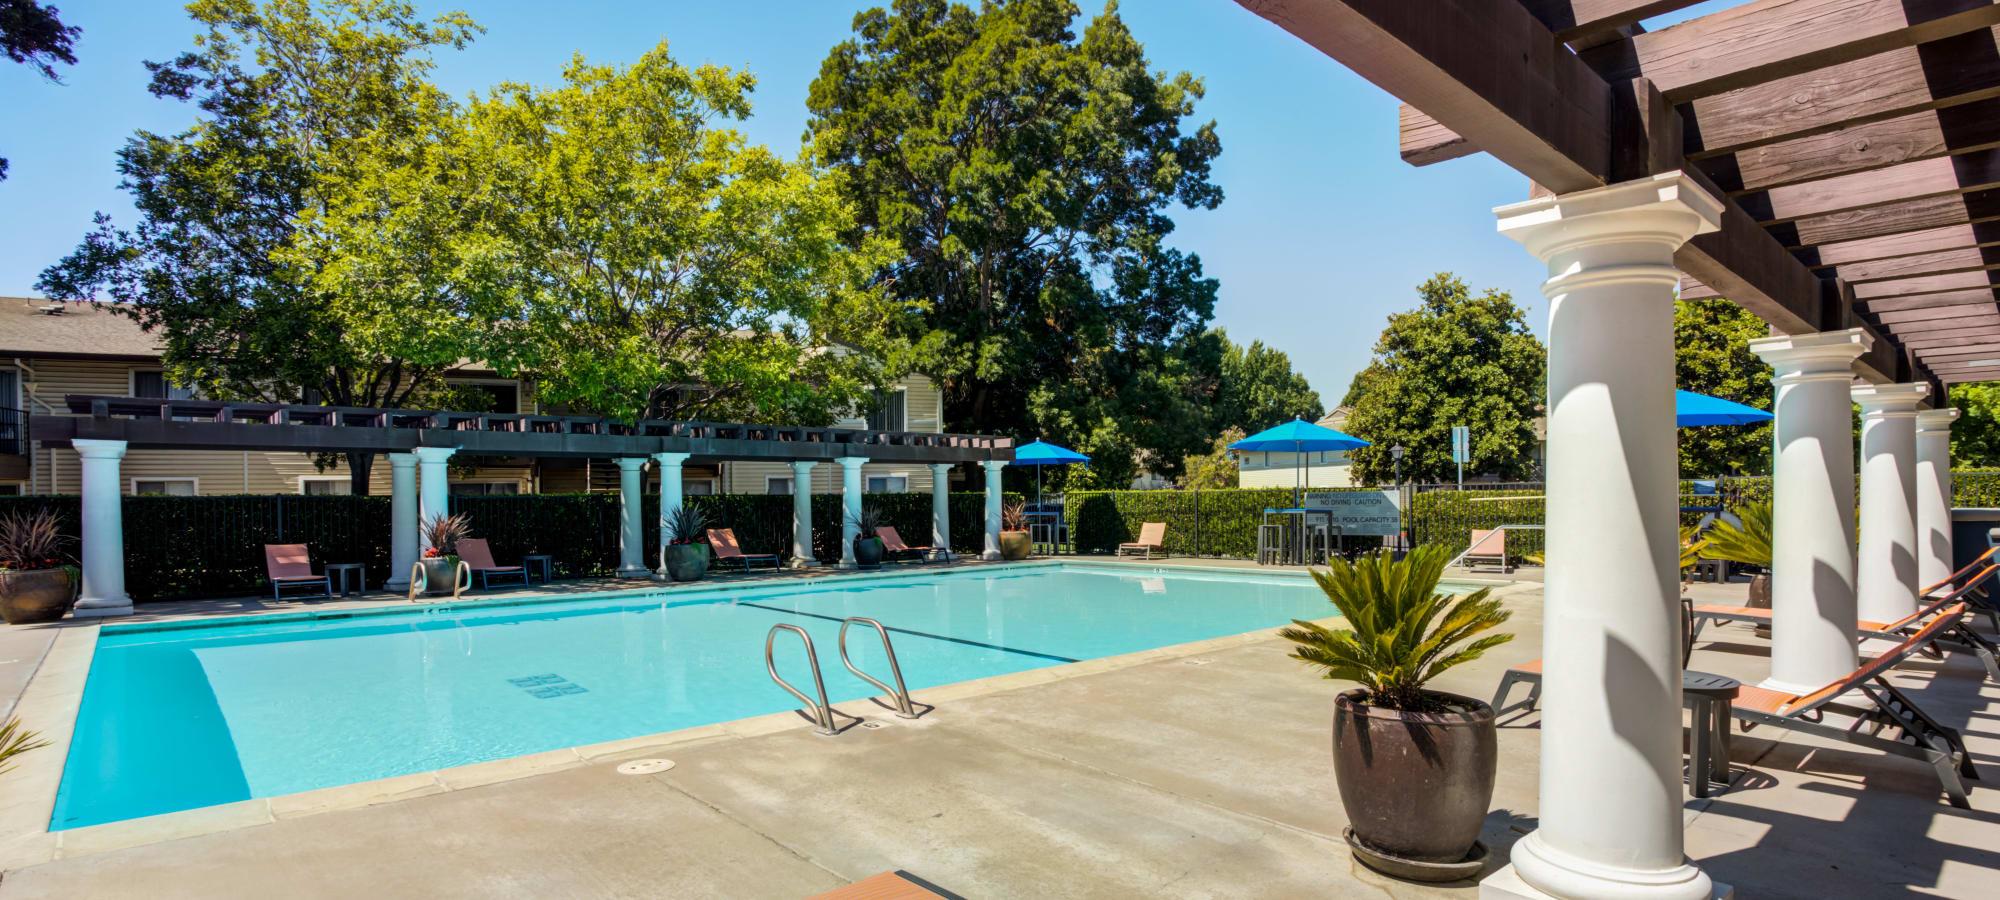 The Woodlands Apartments in Sacramento, California